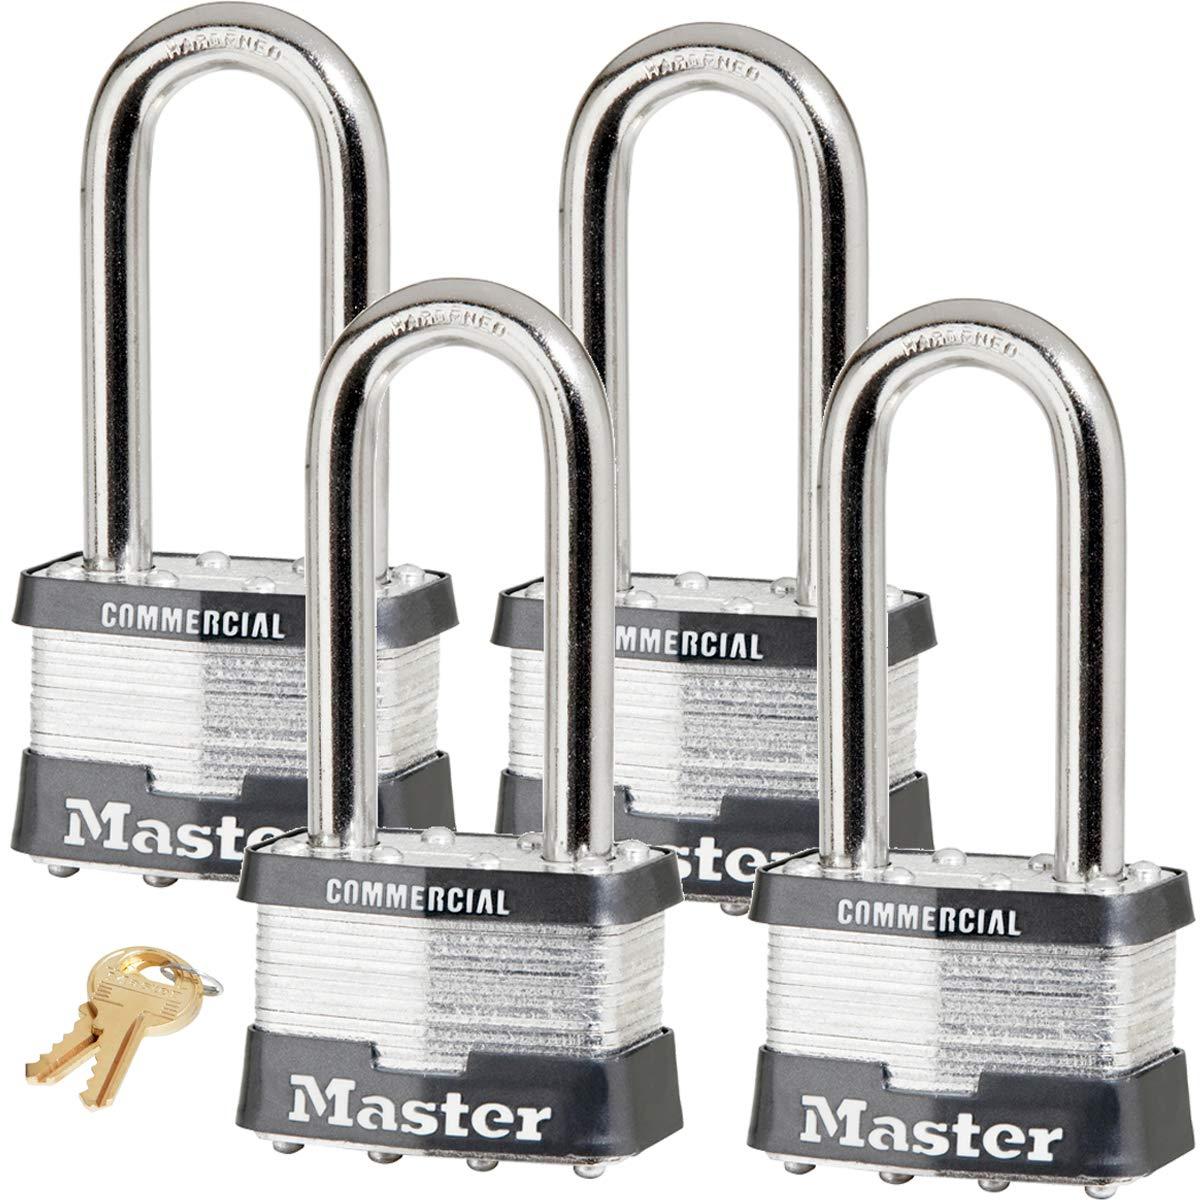 Master Lock Padlock - 2''W Body x 2-1/2''L Shackle, Four (4) Keyed Alike Locks 25NKALJ-4 w/Bump Stop Technology